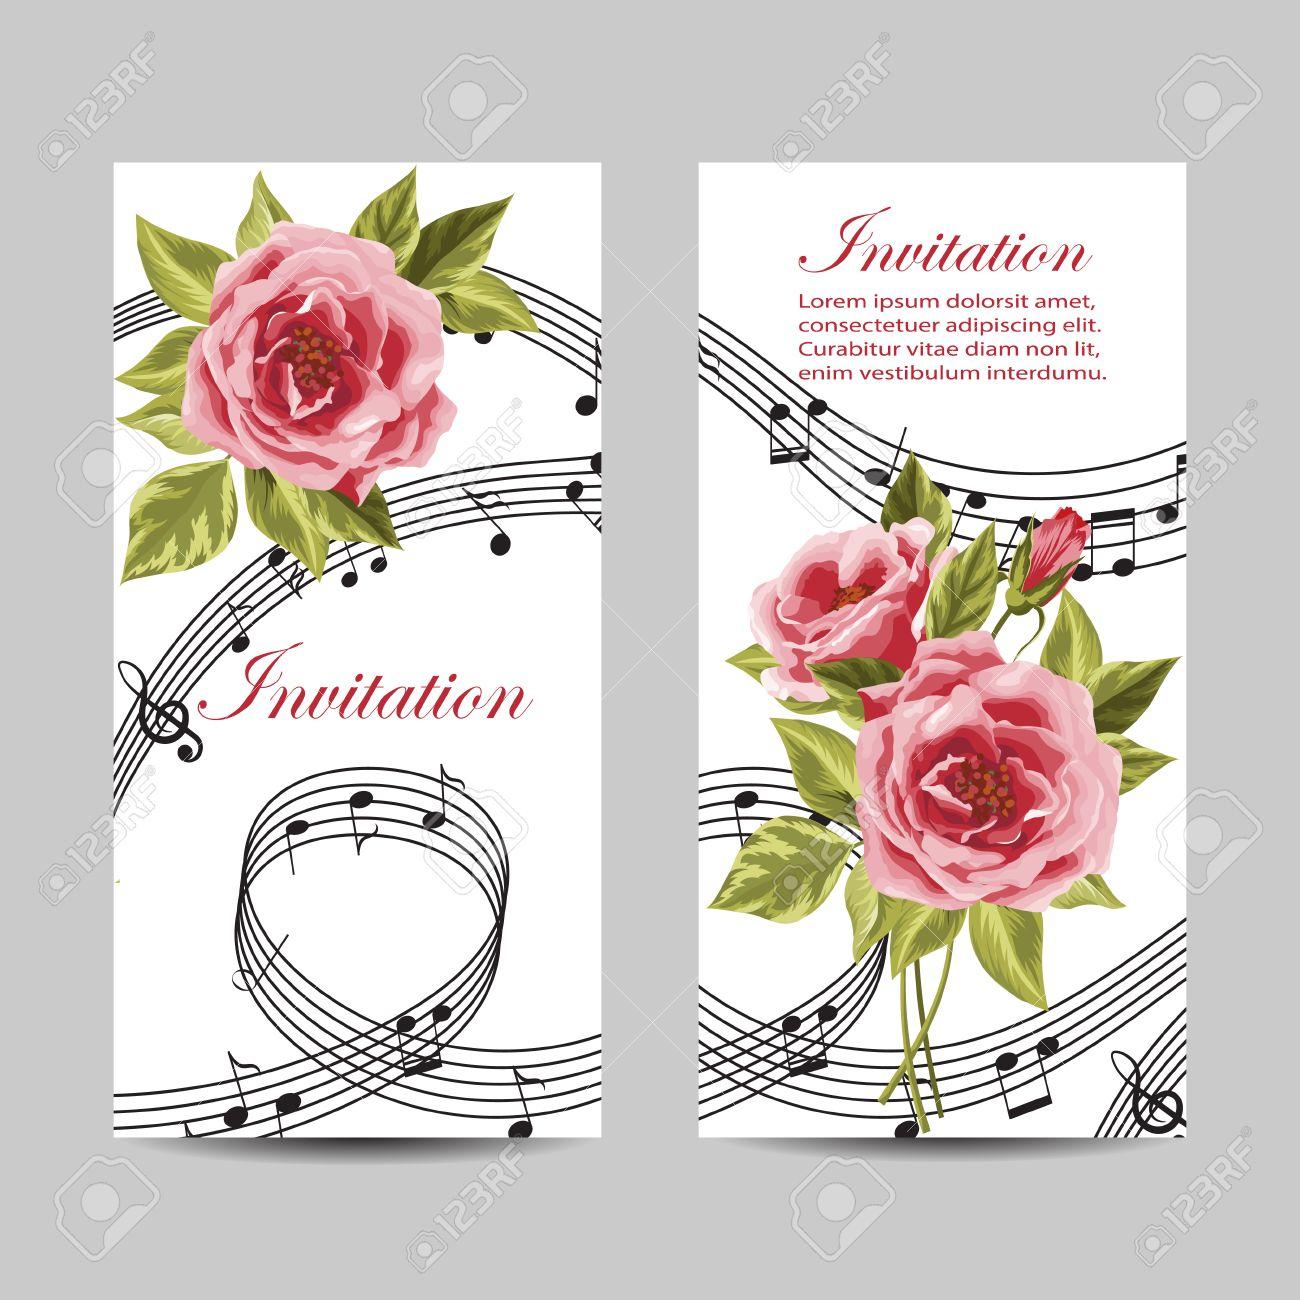 Set of wedding invitation cards design beautiful pink roses set of wedding invitation cards design beautiful pink roses and music notes on white background stopboris Images